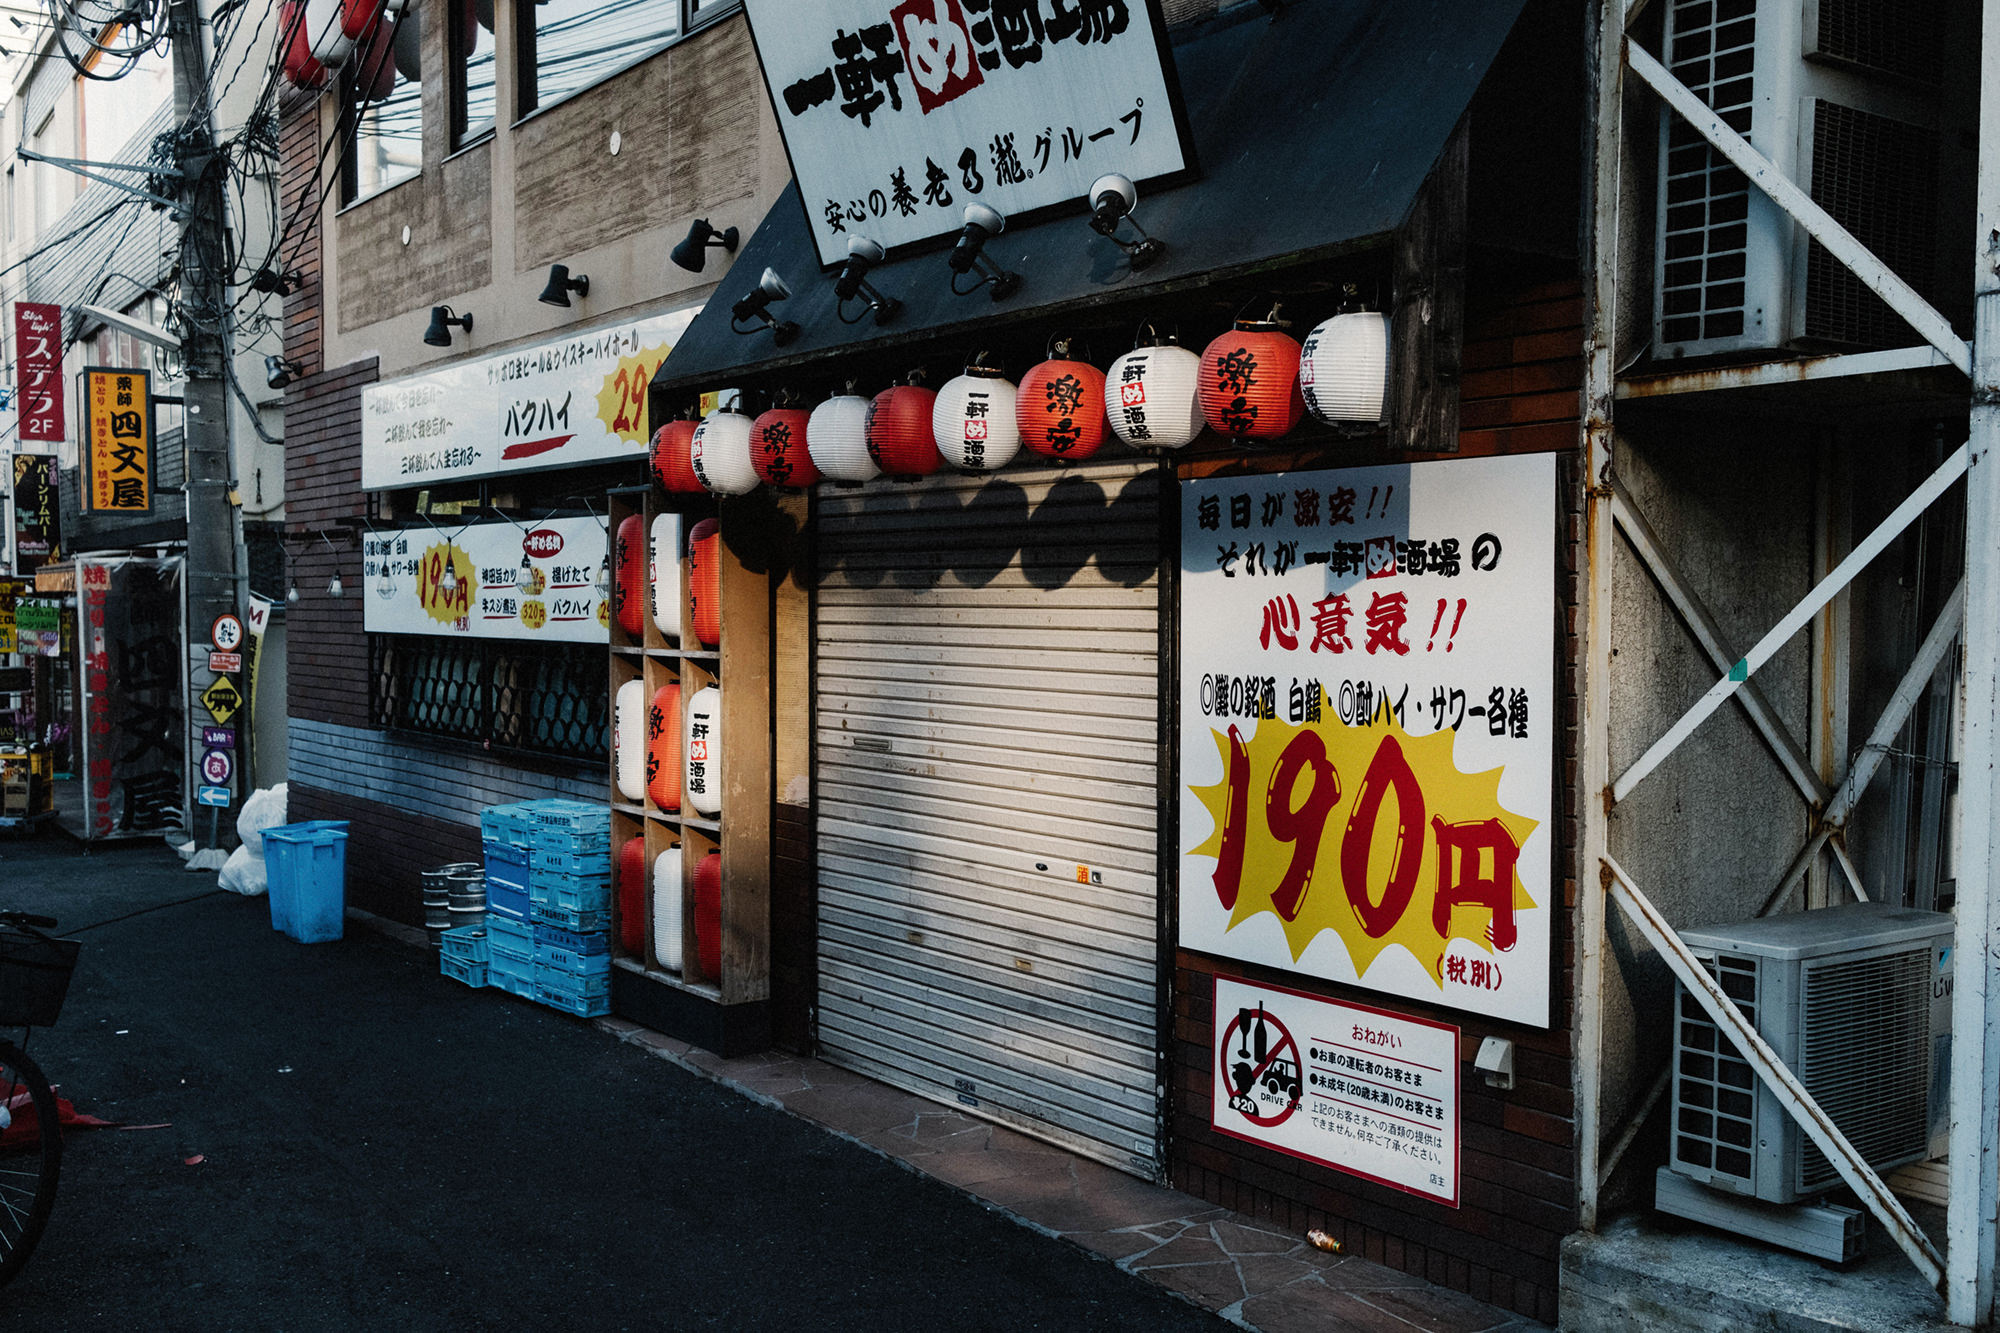 Tokyo David Guenther -020.JPG